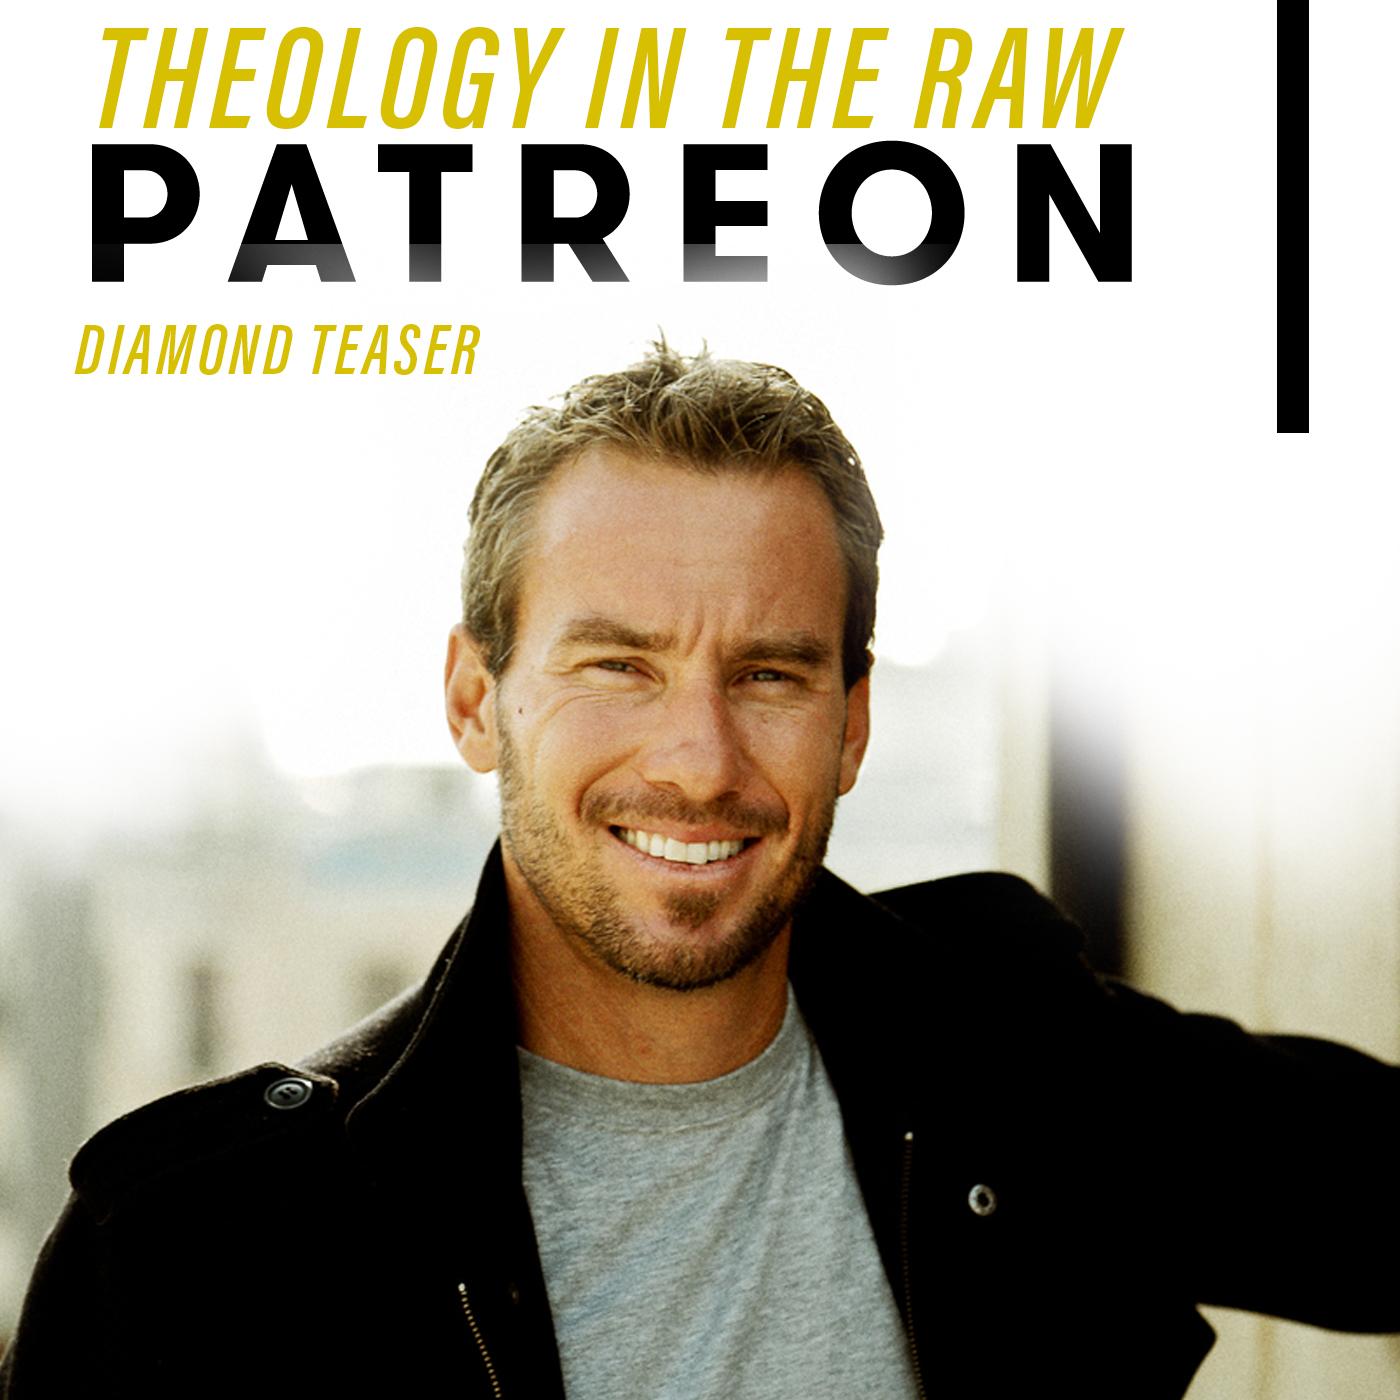 #695 - Is Joel Houston a heretic?...